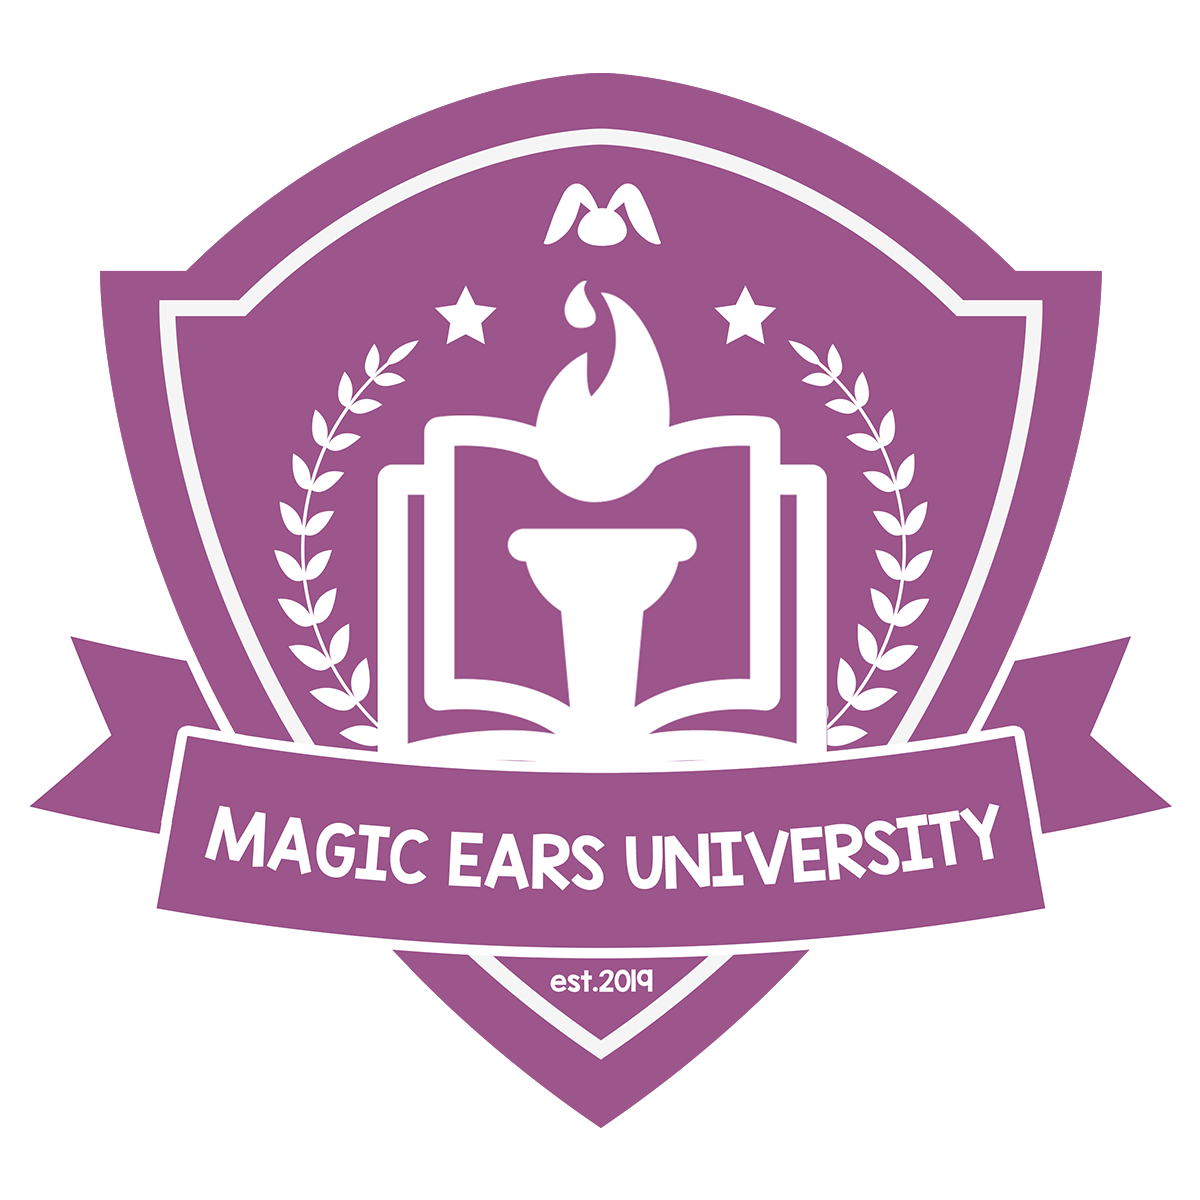 Magic Ears University logo crest